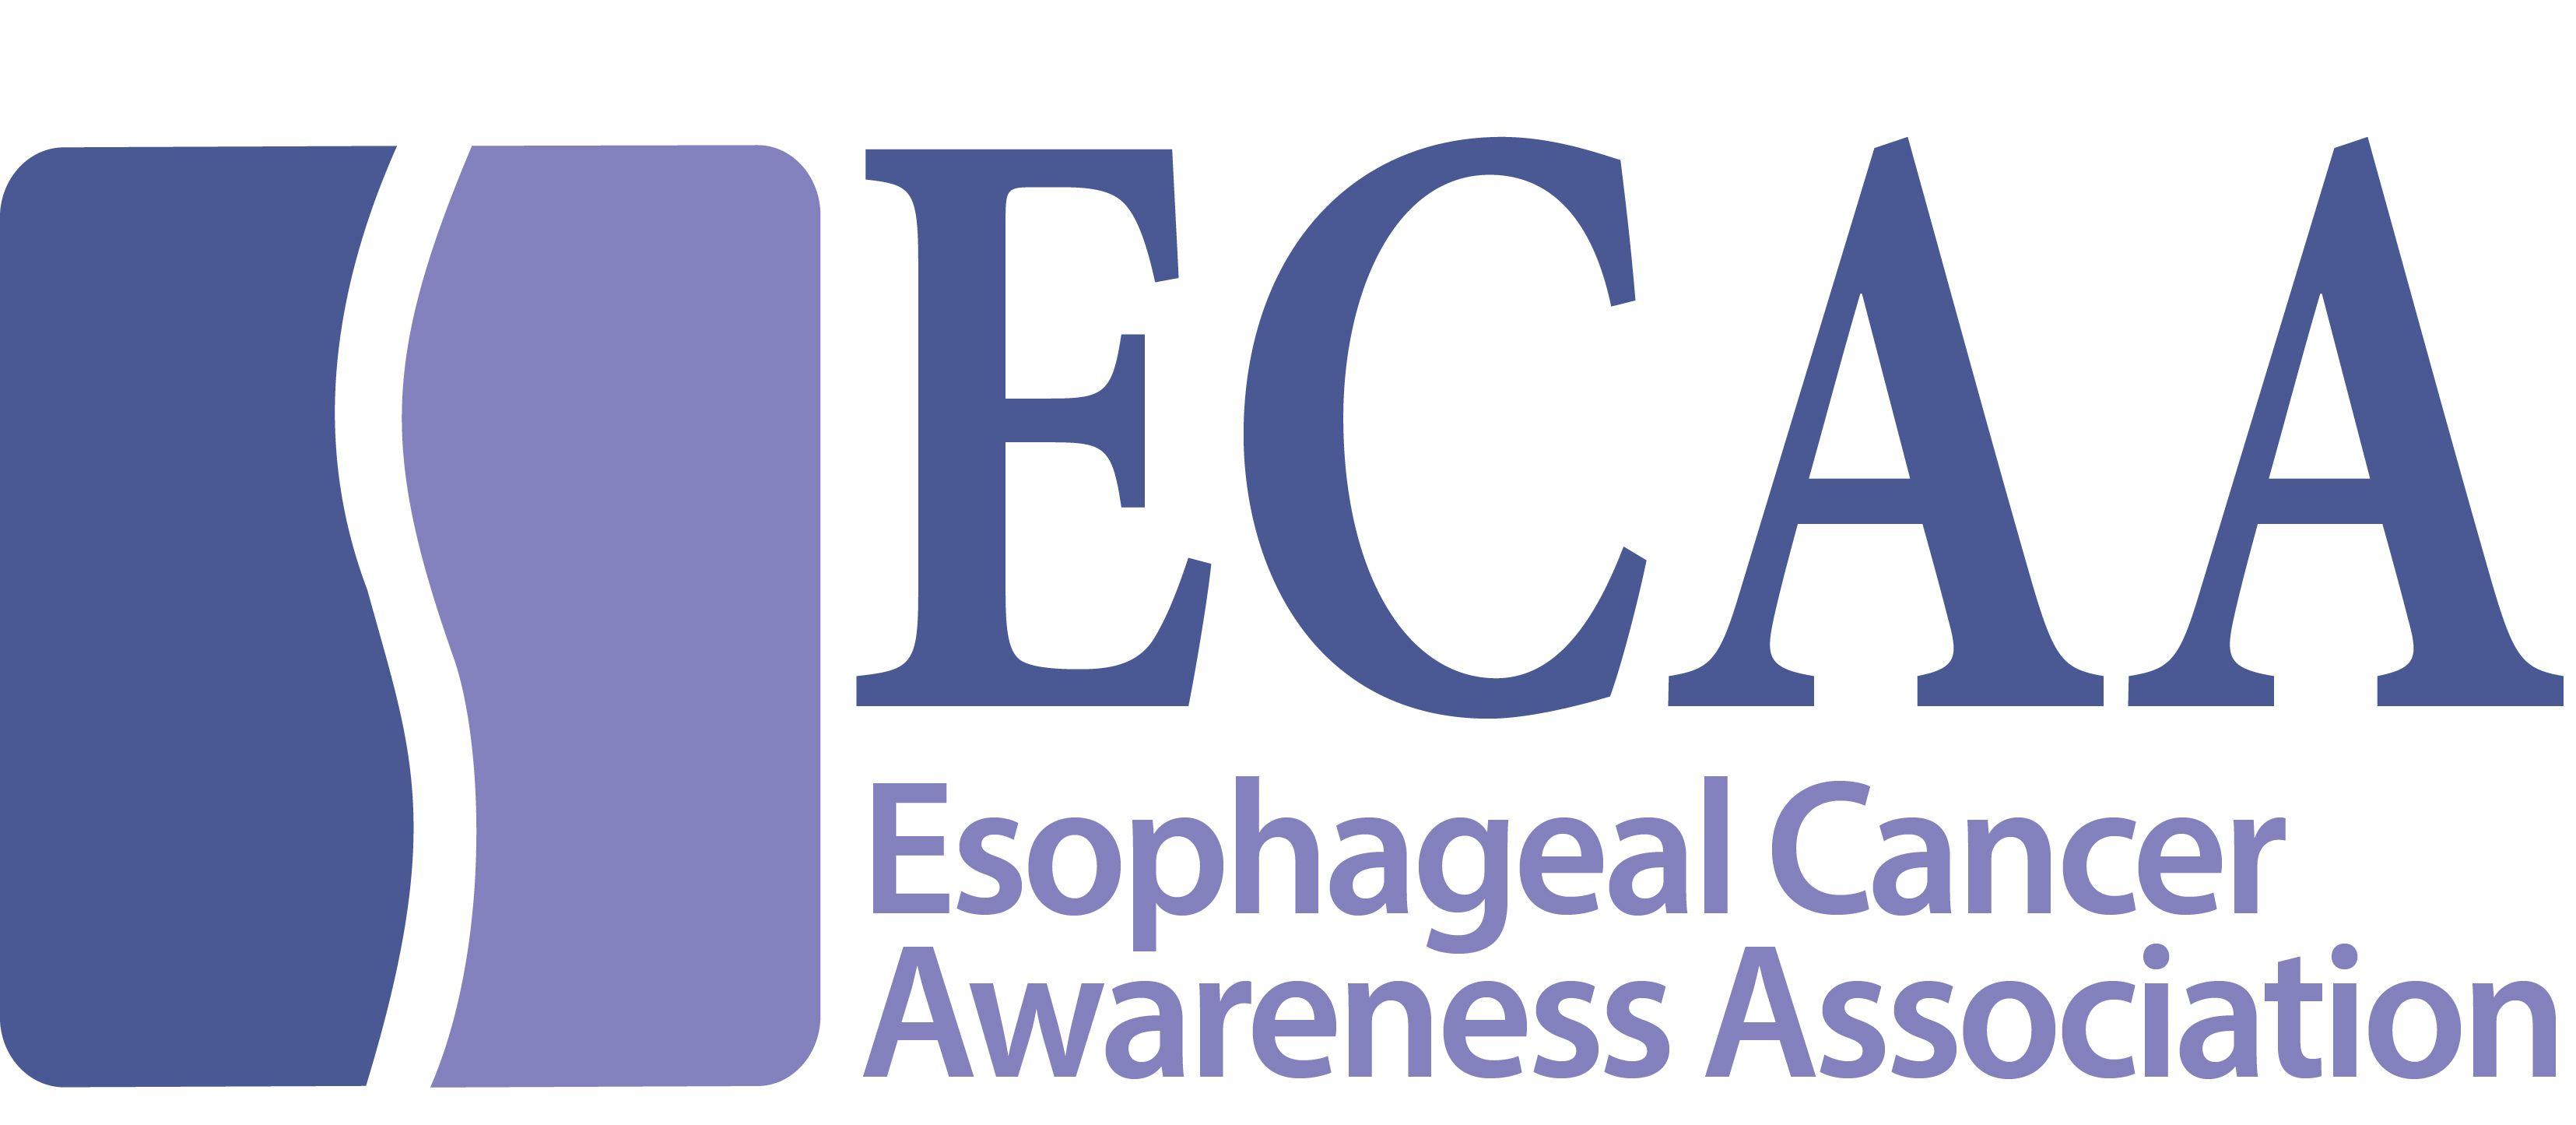 Esophageal Cancer Awareness Association